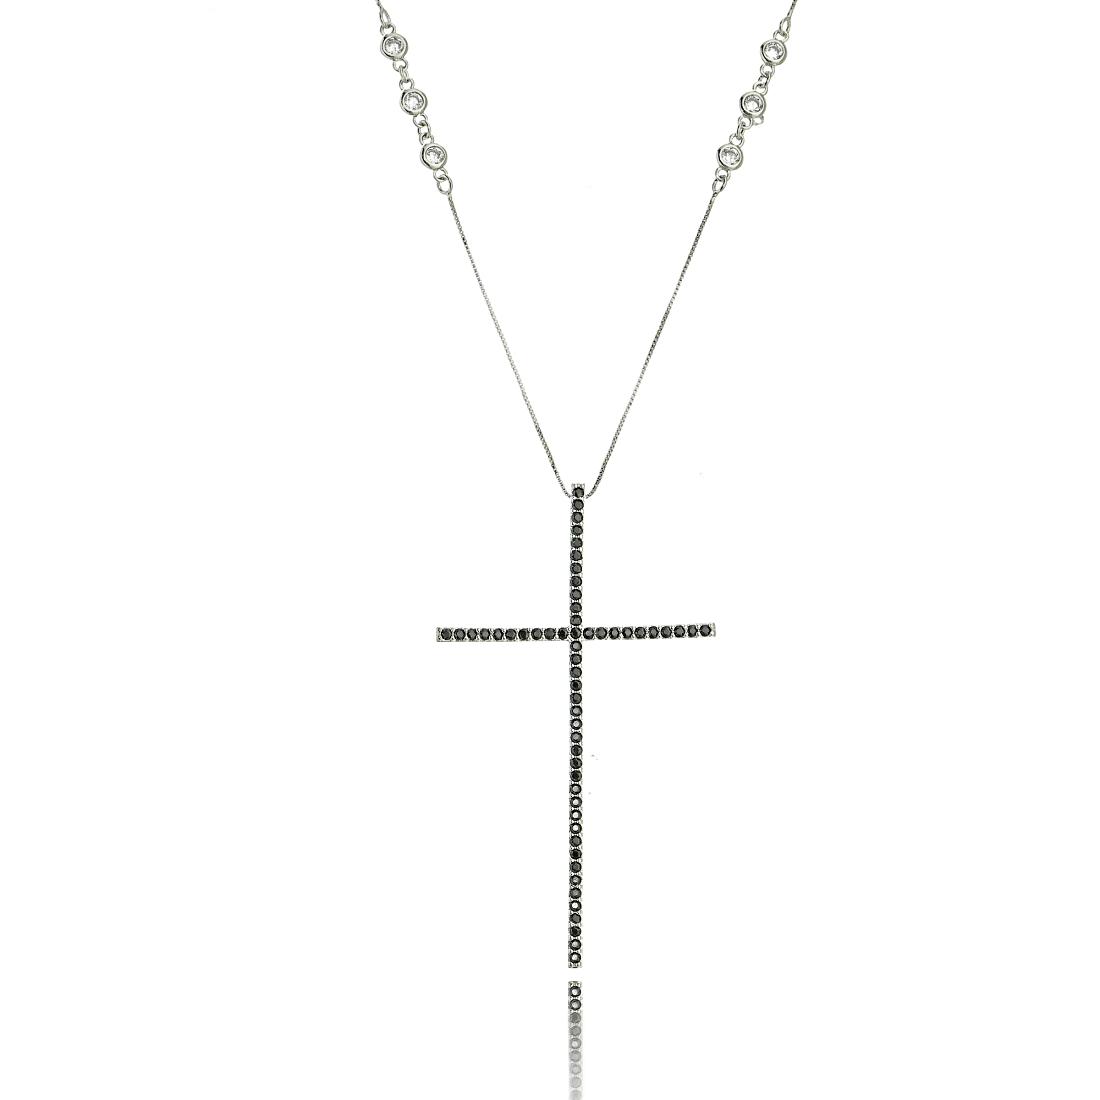 Colar Crucifixo Celebridades Grande 4 x 7 cm Zircônia Preta Corrente Tiffy Semijoia Ródio Branco  - Soloyou